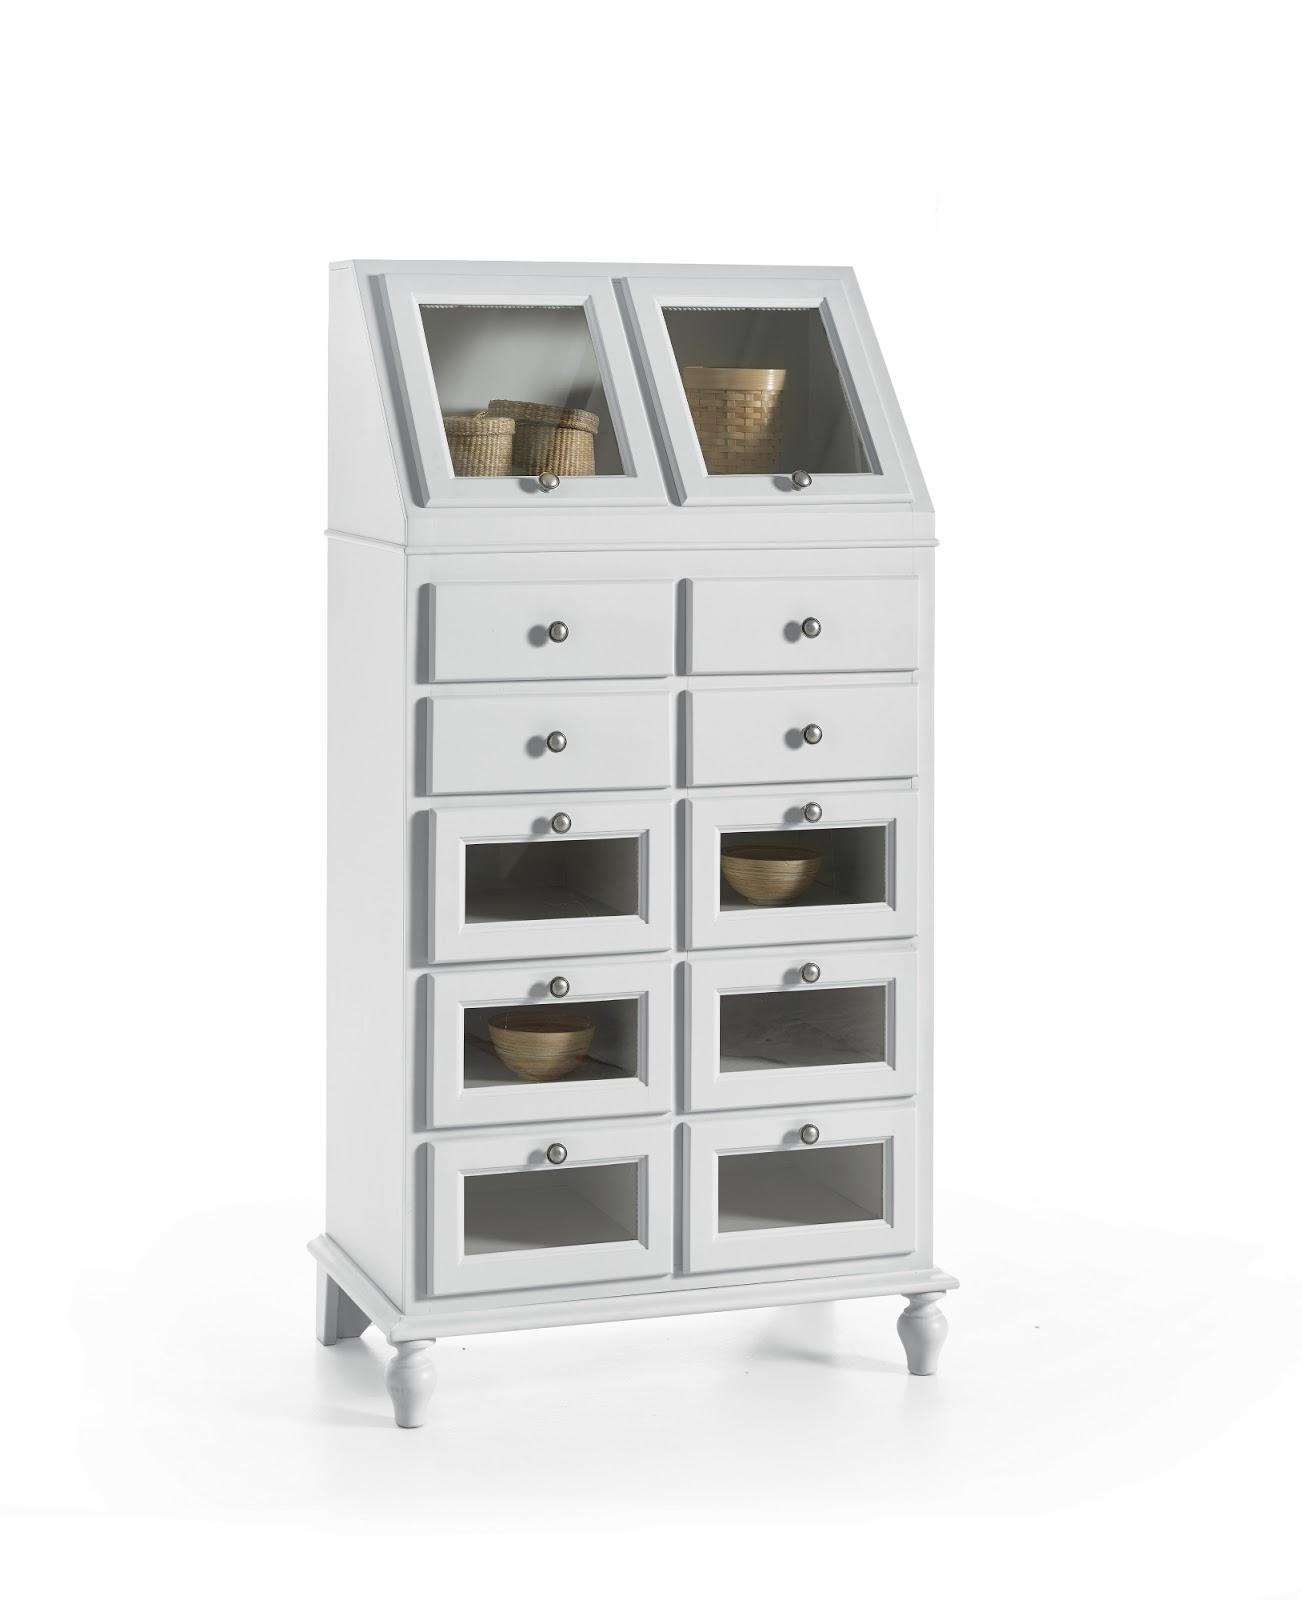 Dispensa mobile da cucina in legno 10 cassetti 2 ribalta in legno bianco ebay - Mobile cucina dispensa ...